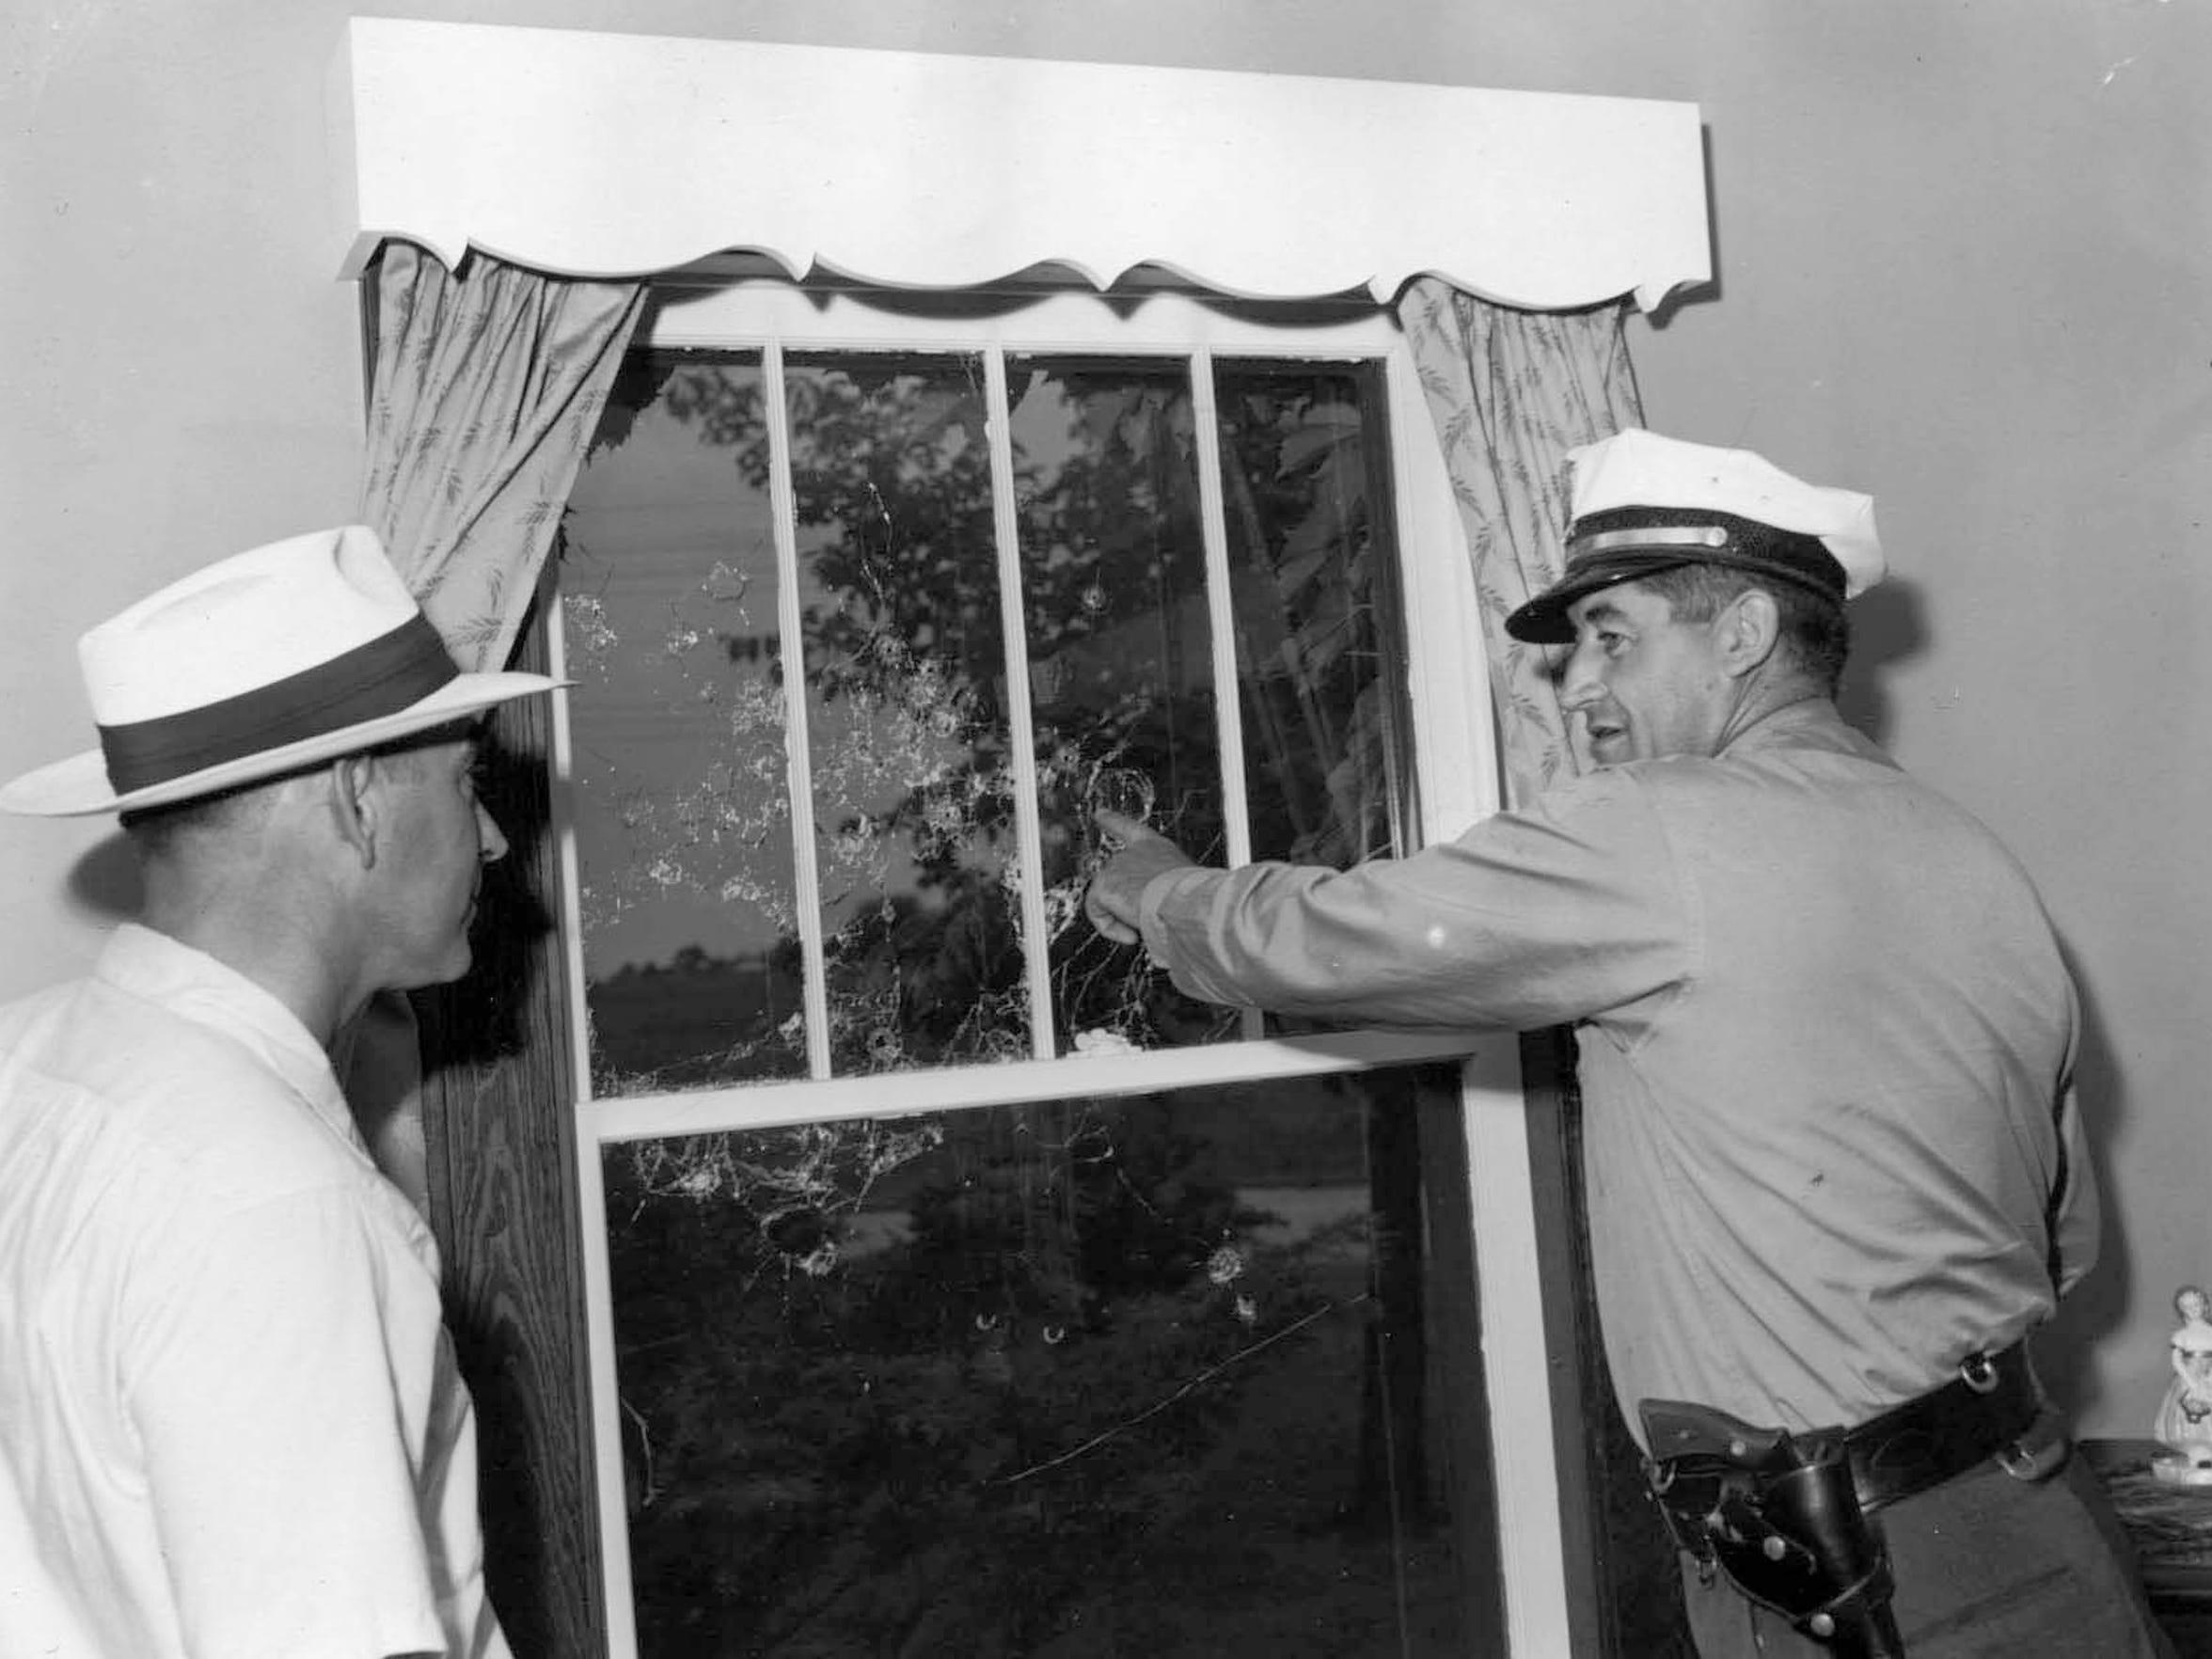 6-29-1954Shotgun blast window at Harold J. curtis, R3 Sheboygan and under Sheriff Lawrence Schmitz look over the damage.